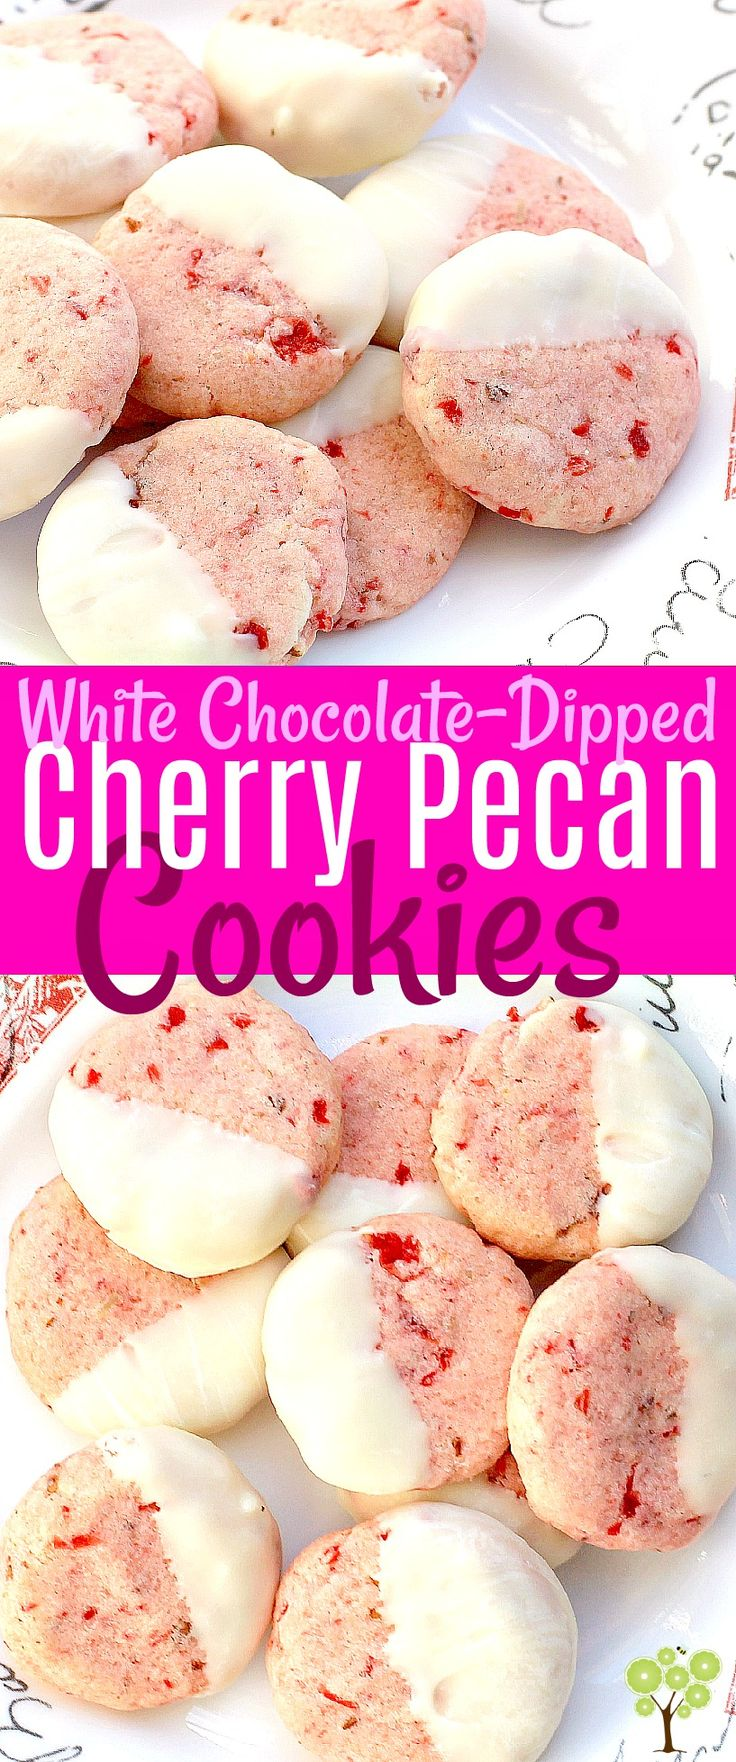 White Chocolate-Dipped, Cherry Pecan Cookies #cookies #food #recipe #pink